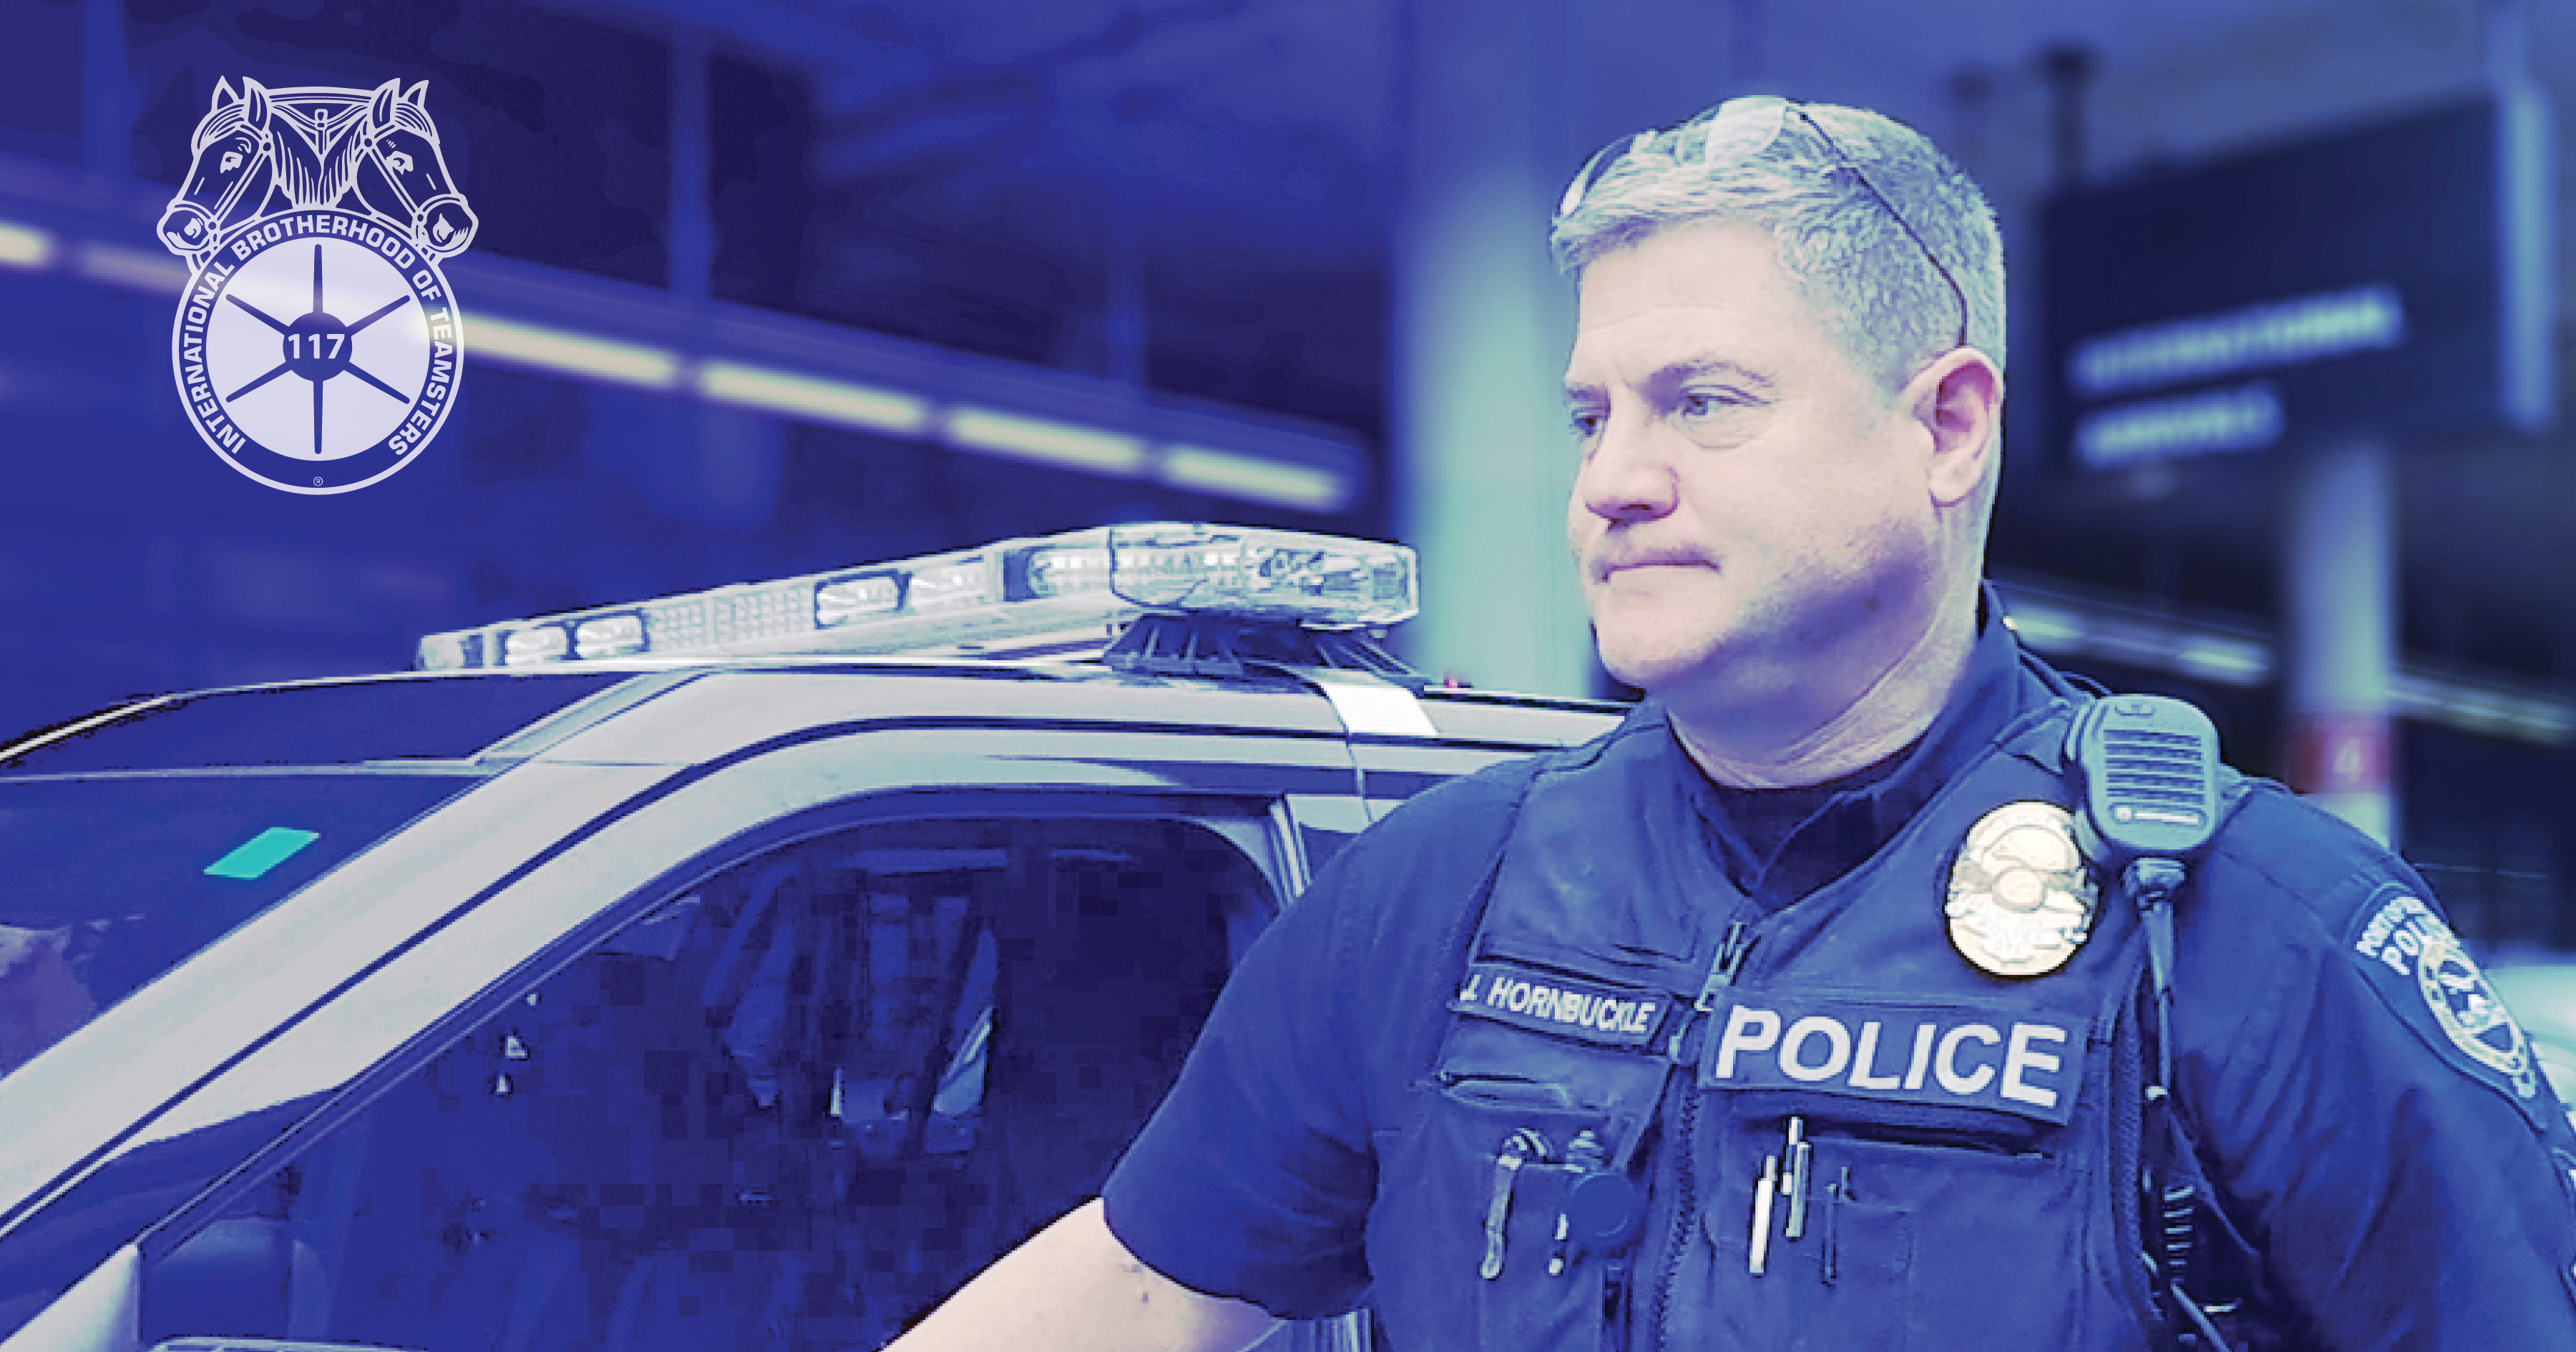 Law_Enforcement_image.jpg